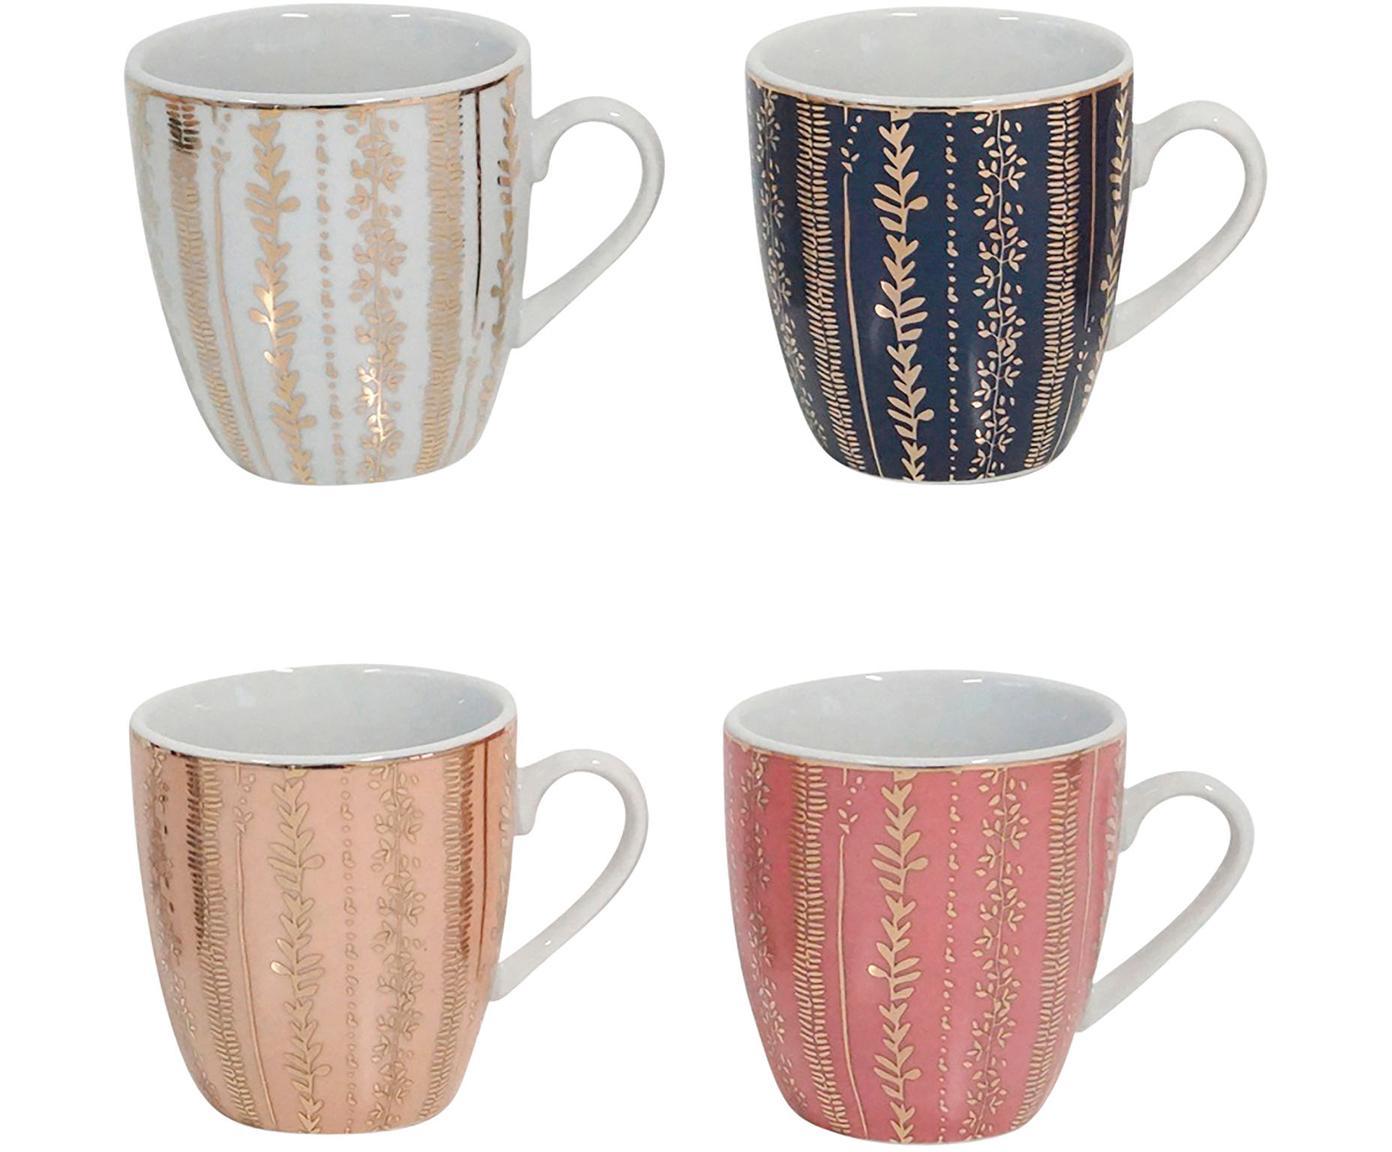 Kaffeetassen Veg-Gold mit Golddetails, 4er-Set, Porzellan, Rosa, Blau, Ø 7 x H 8 cm